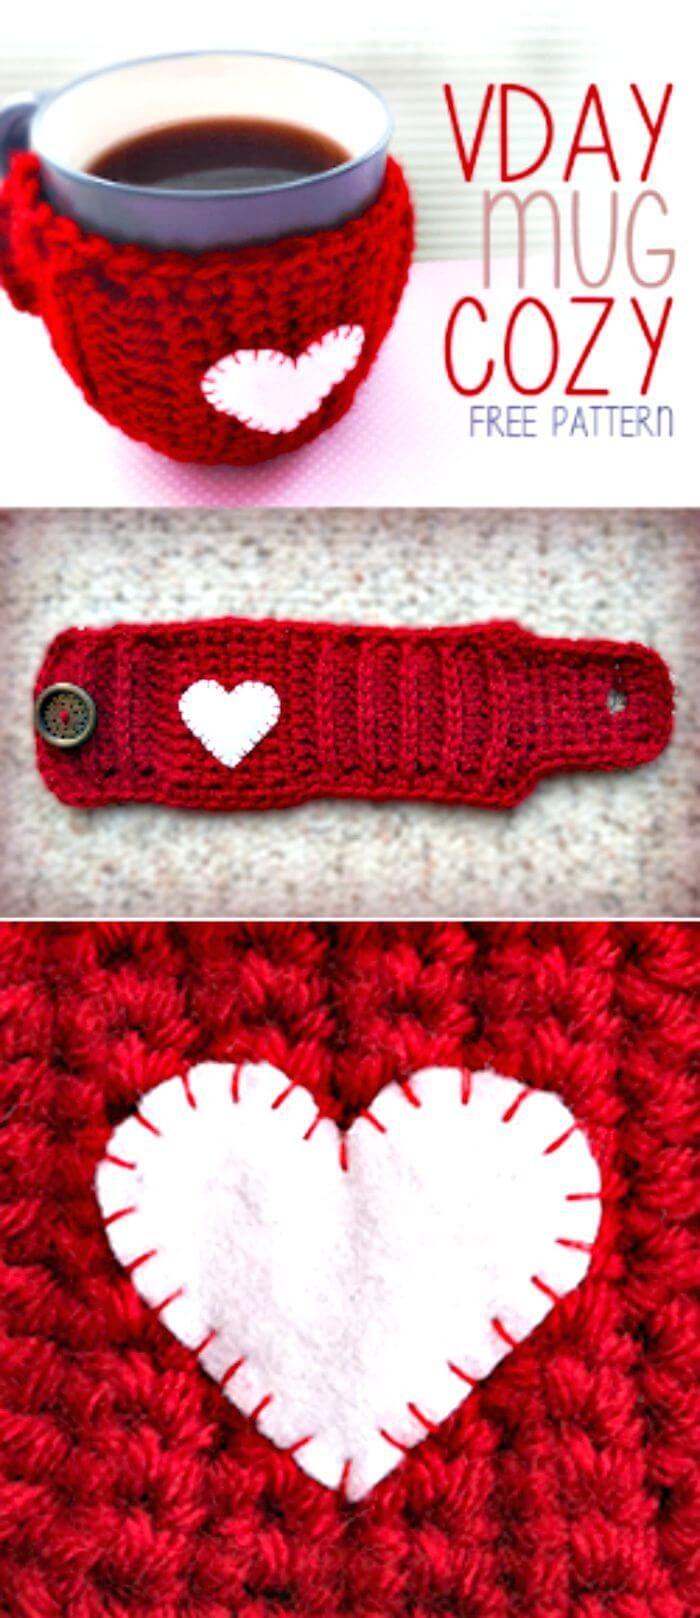 Crochet Valentine's Day Mug Cozy – Free Pattern - 94 Free Crochet Patterns for Valentine's Day Gifts - DIY & Crafts